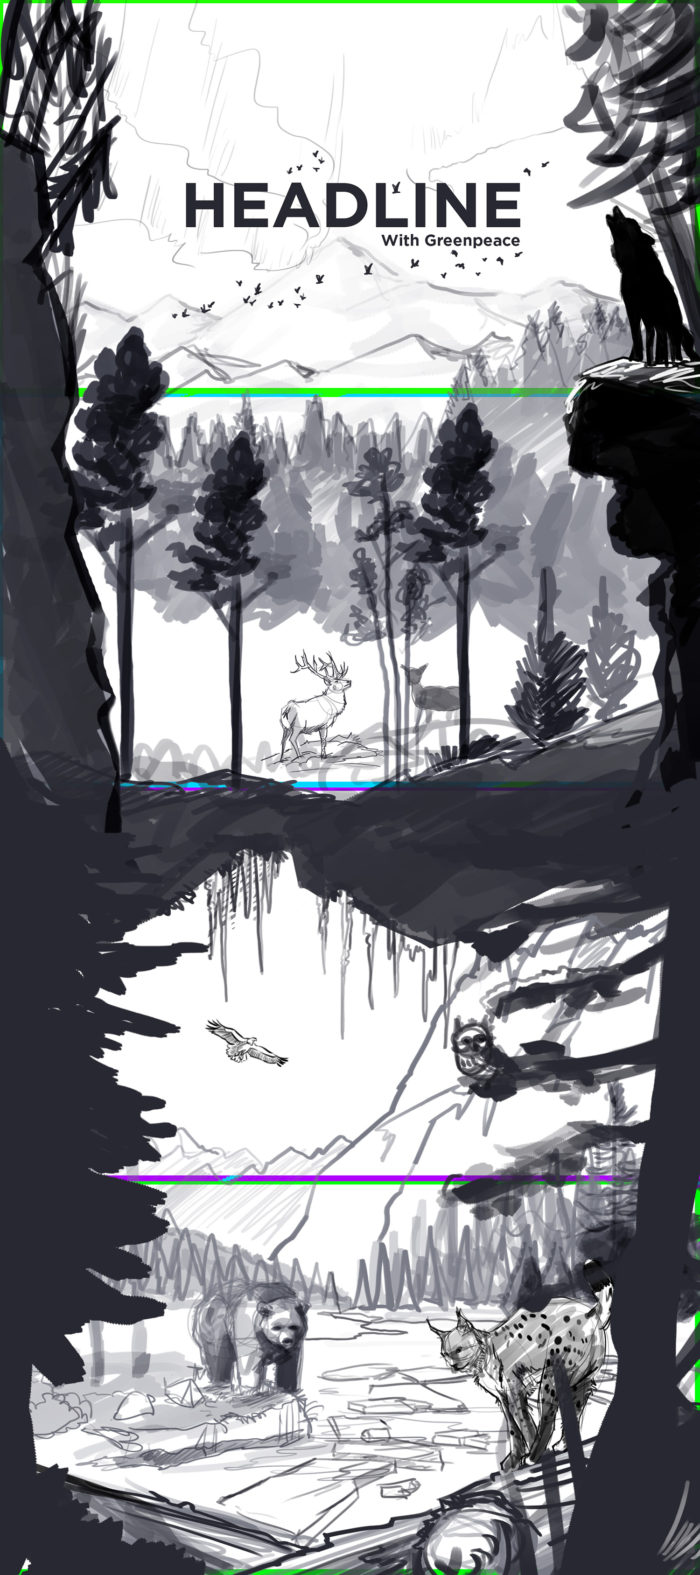 Illustrations vectoriel - Projet Greenpeace -Headline - Campione Orlando - Graphisme - Paralaxe - Site web - Alpaga Studio - Sketch